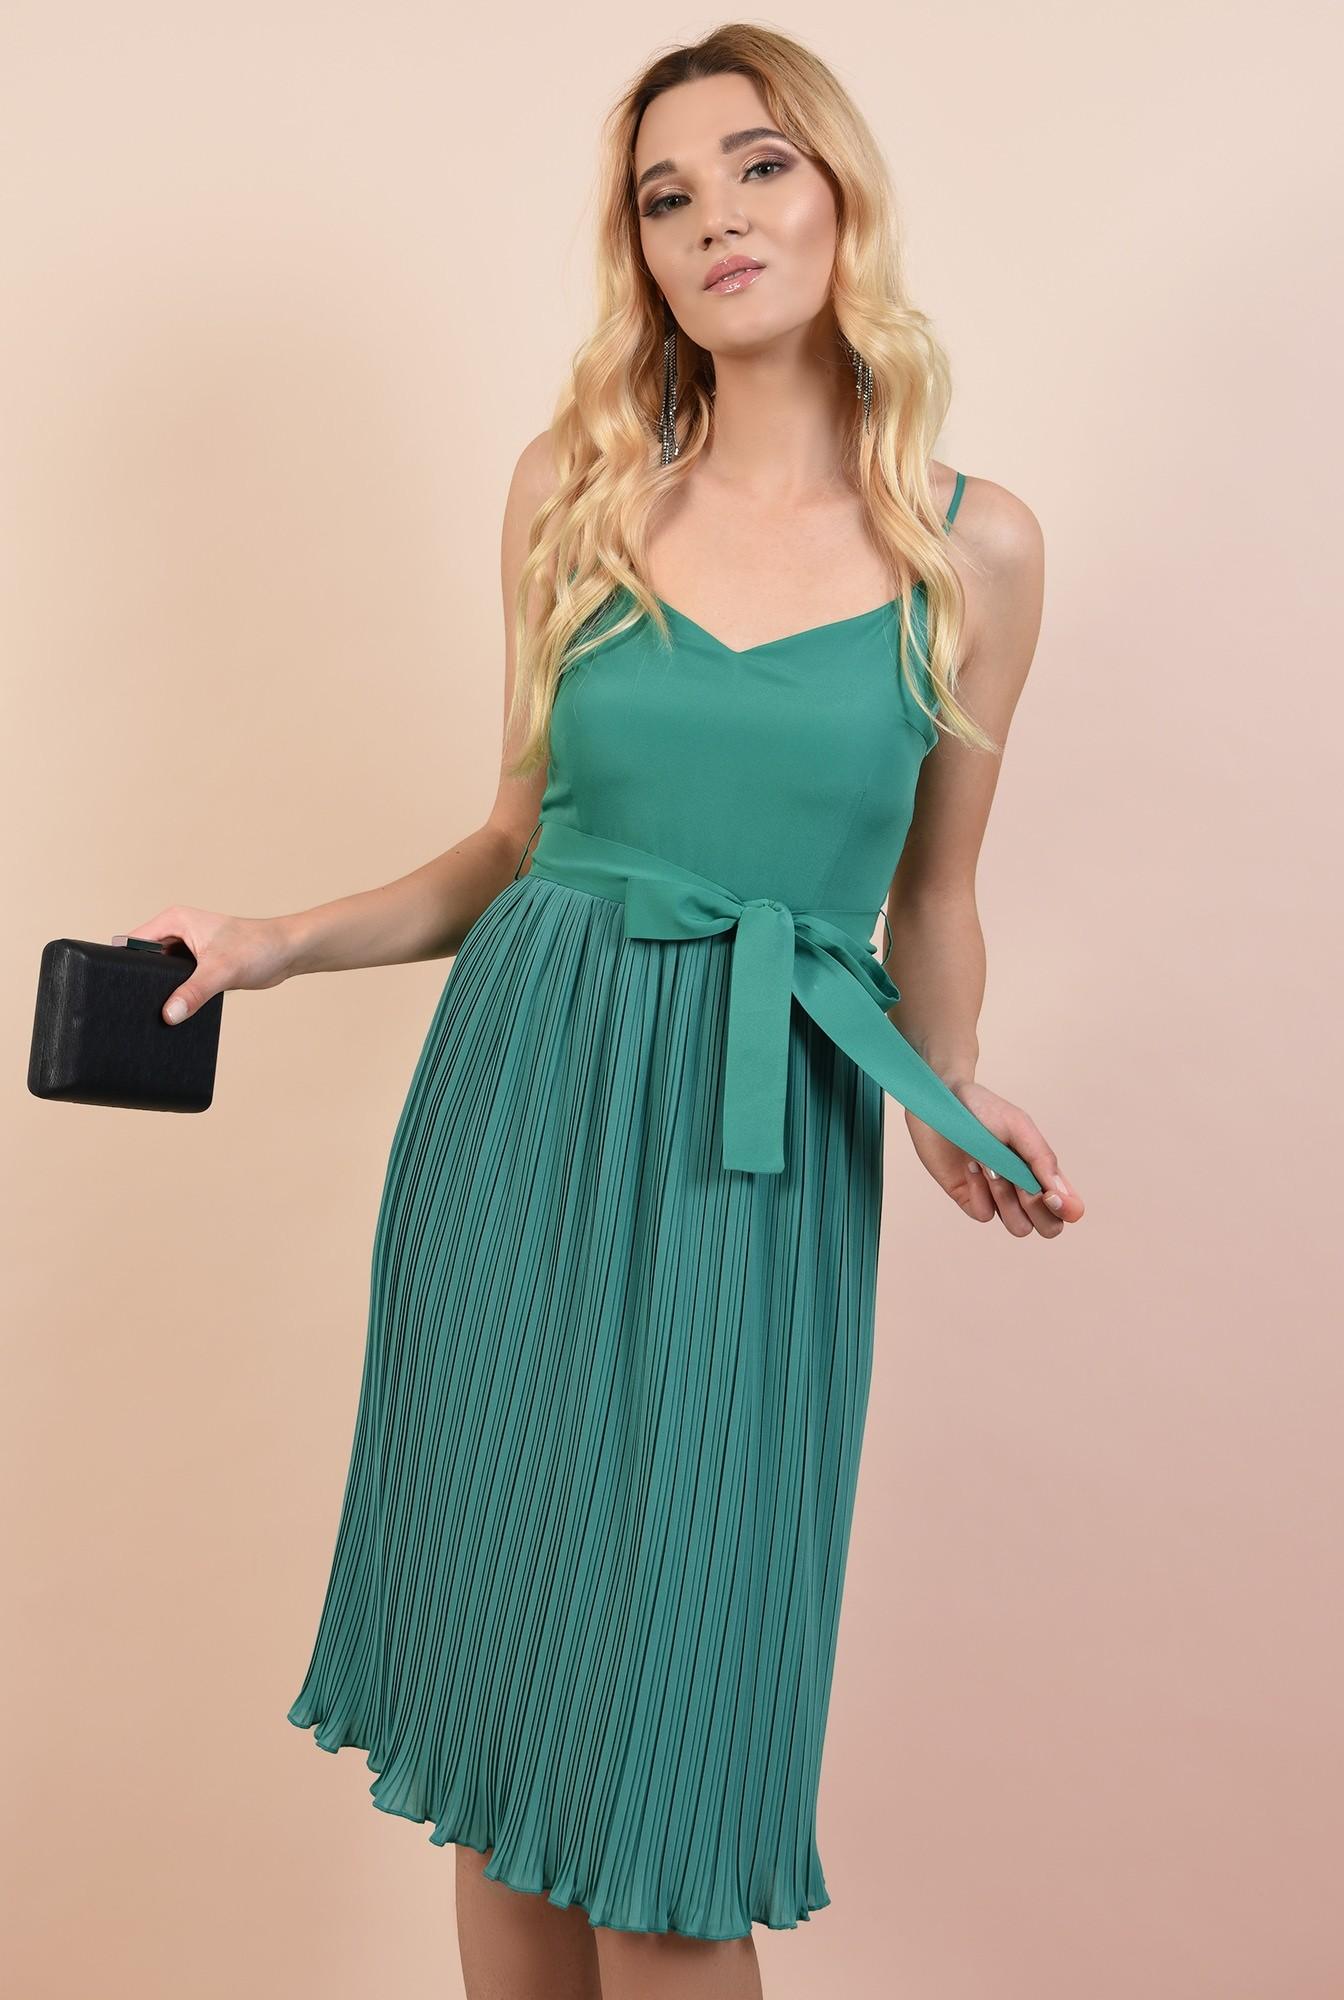 2 - rochie eleganta, midi, din voal plise, cu cordon, verde turcoaz